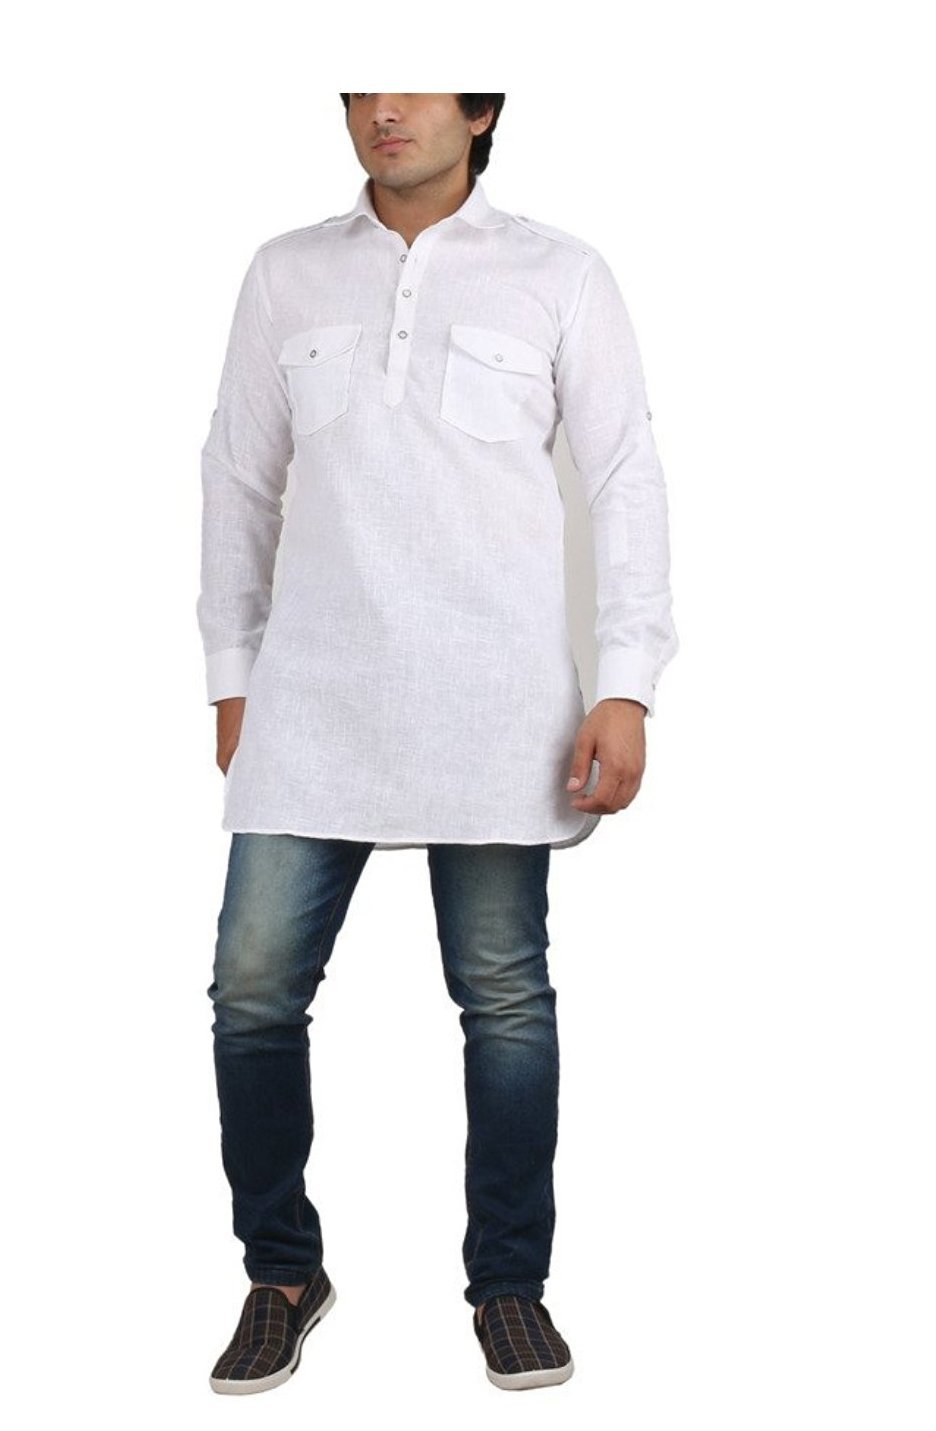 Royal Kurta Men's Fine Cotton Short Pathani Kurta For Denims 38 White